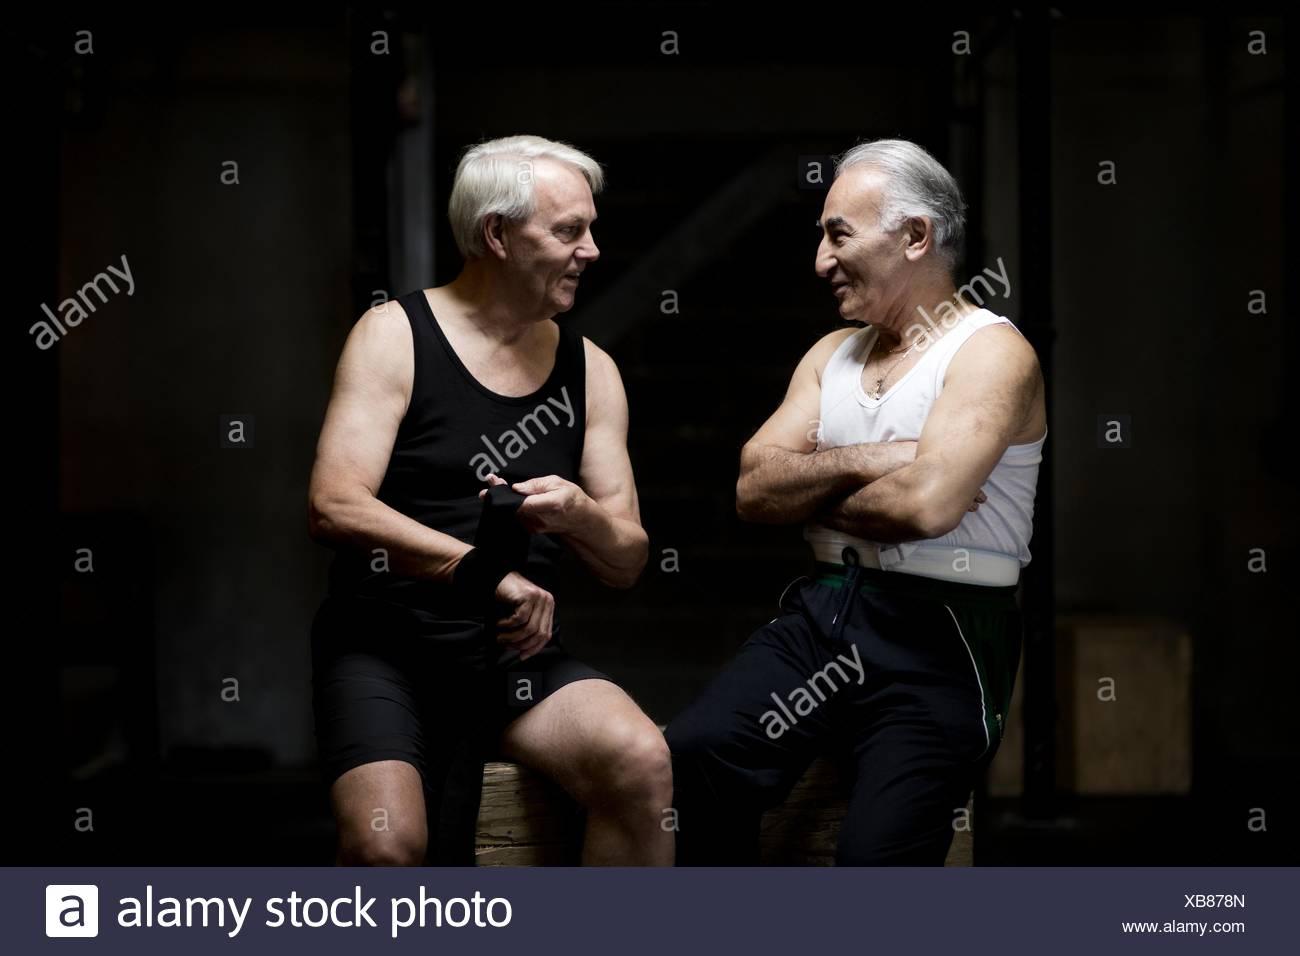 Two senior men chatting and preparing in dark gym - Stock Image